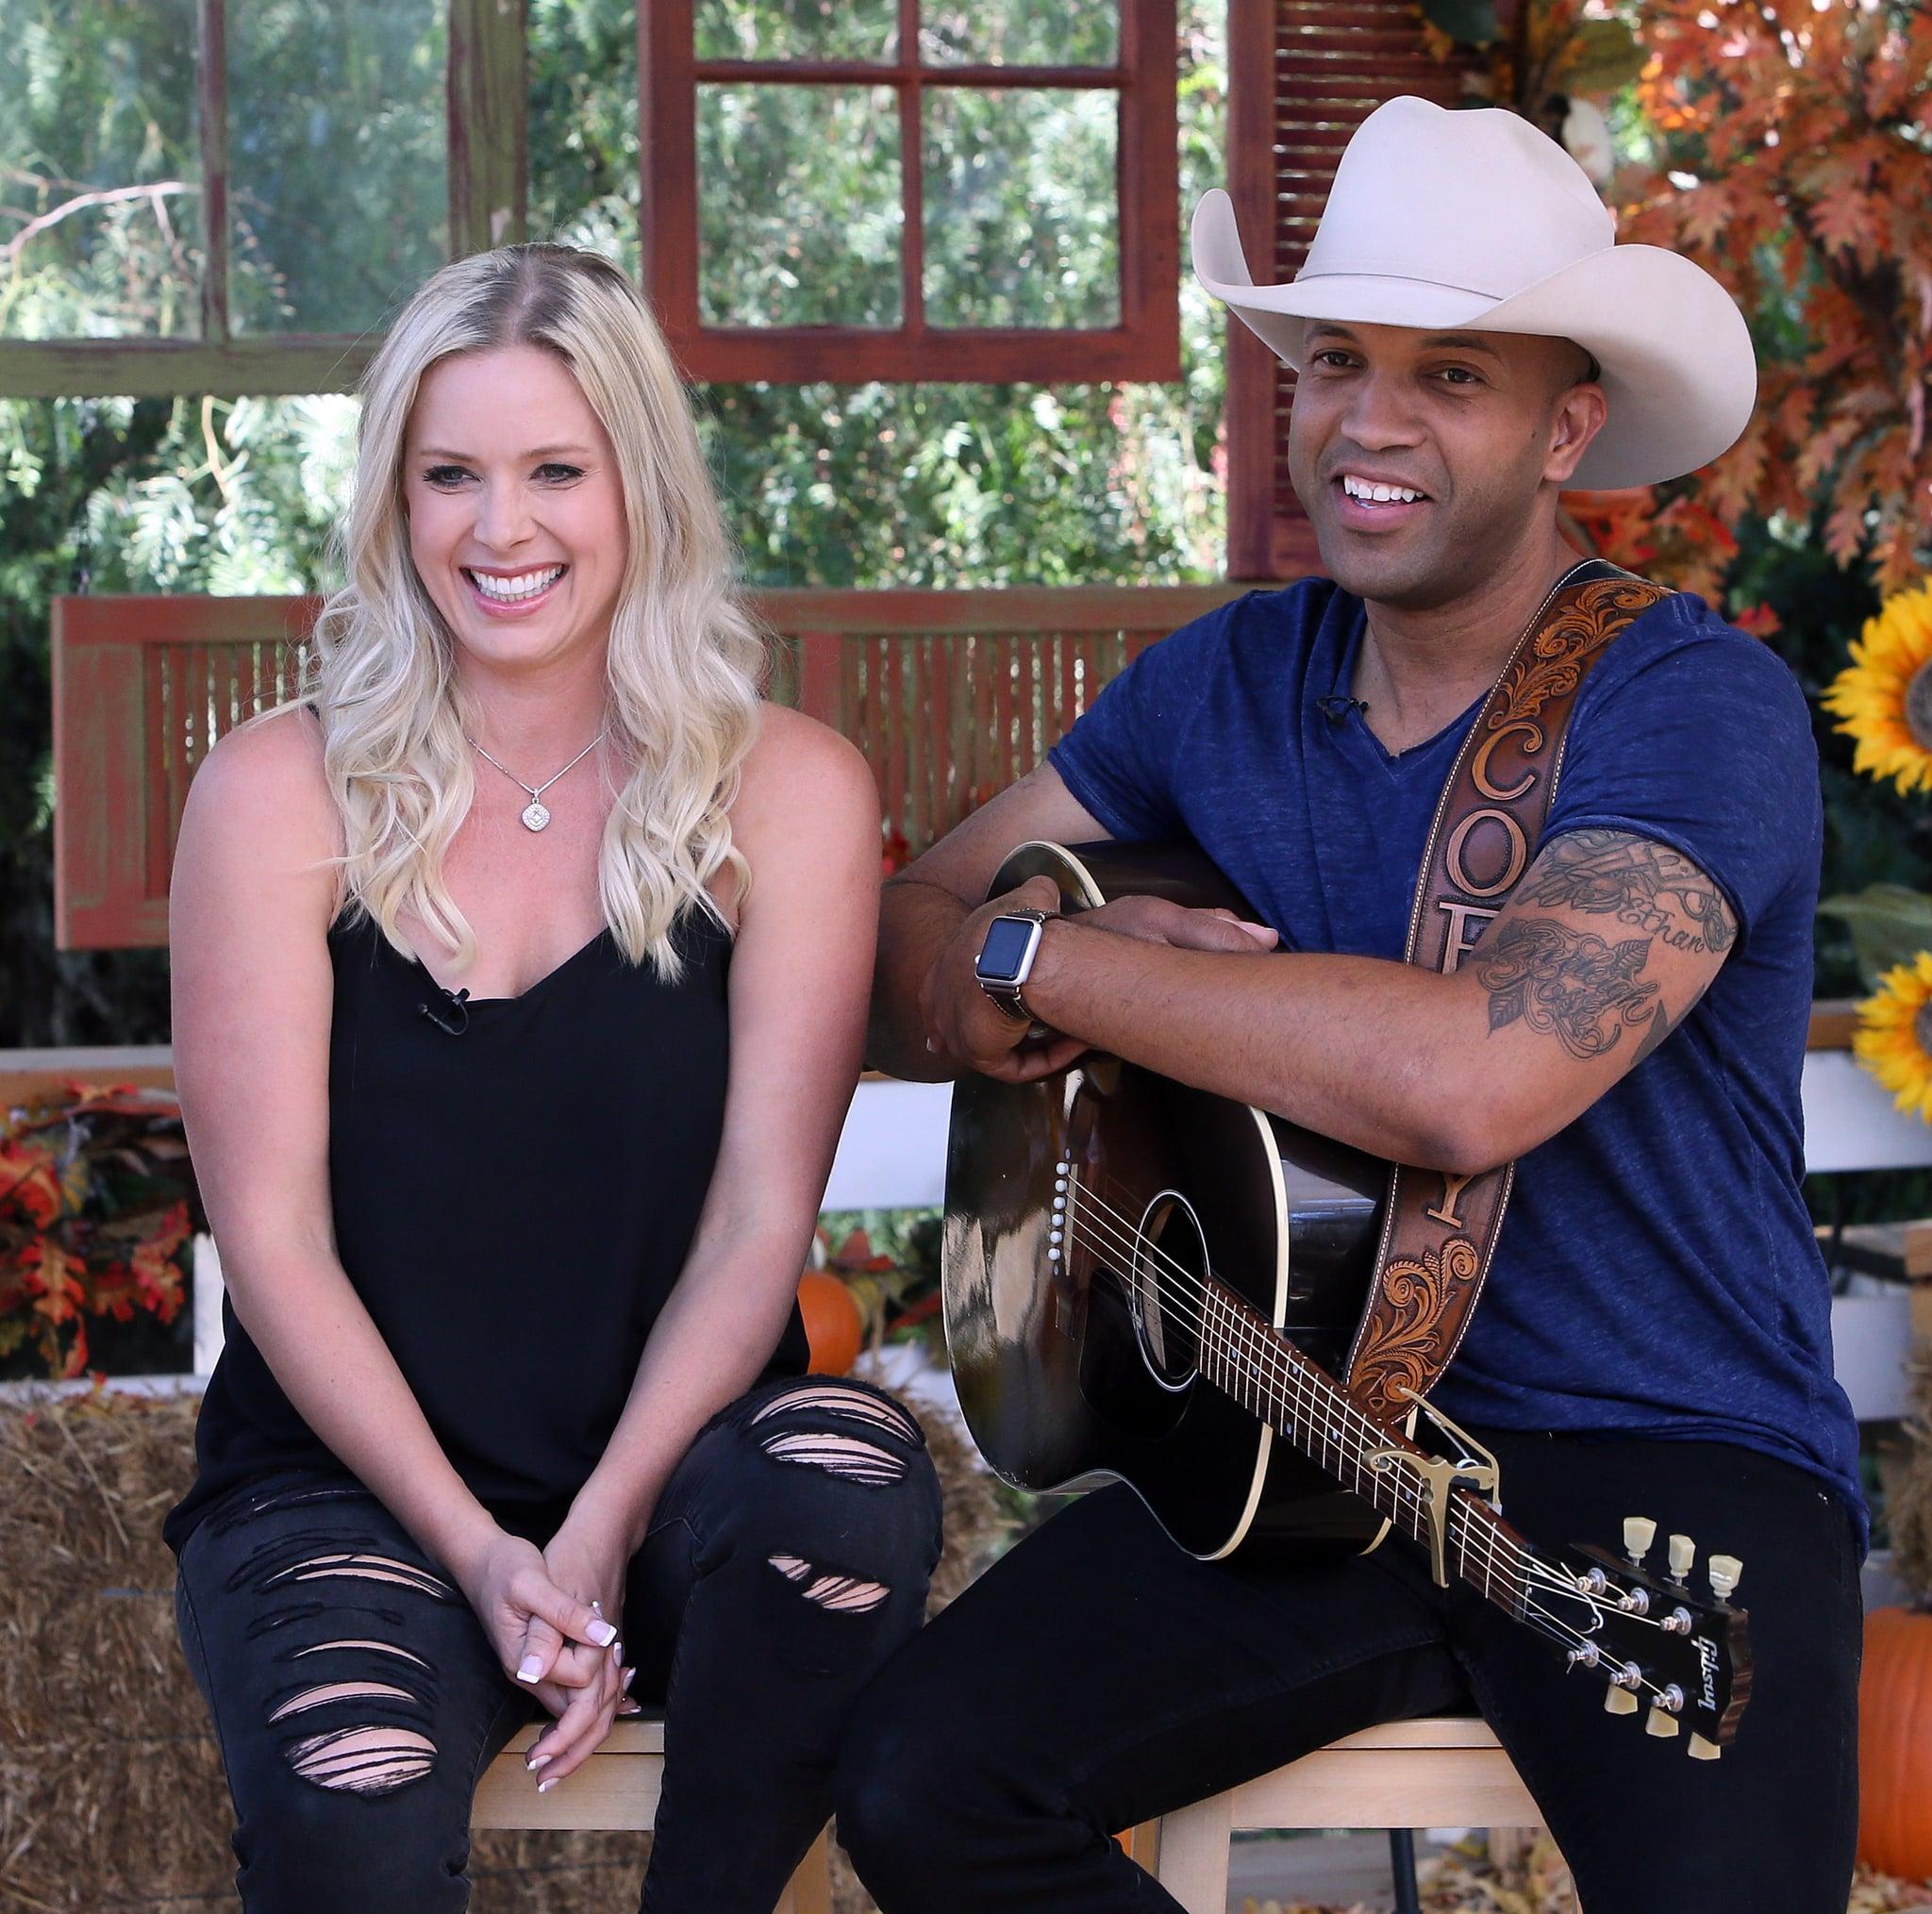 UNIVERSAL CITY, CA - OCTOBER 10:  Singer Coffey Anderson (R) and wife Criscilla Crossland Anderson attend Hallmark's